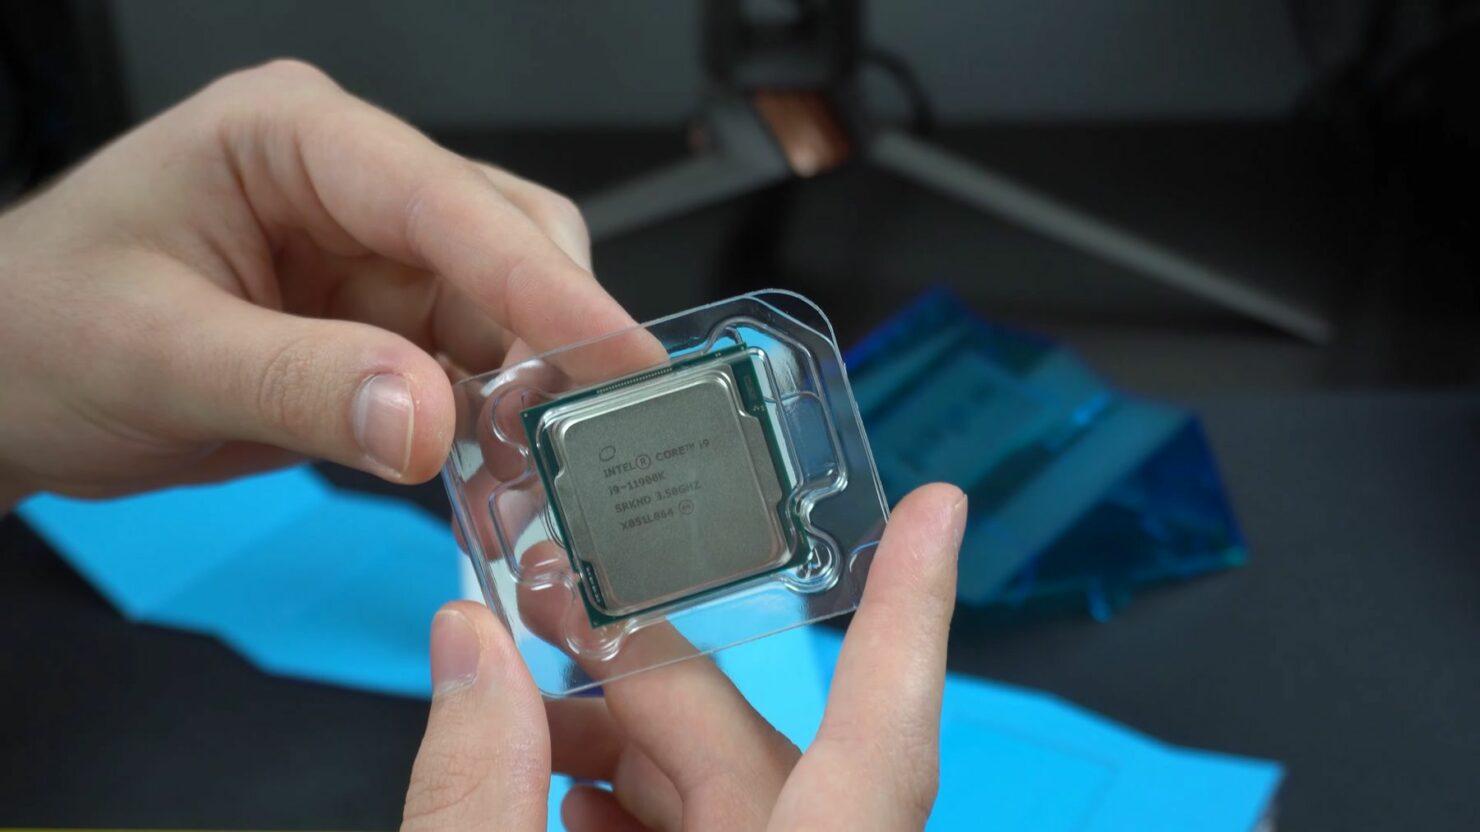 intel-core-i9-11900k-unboxing-1-25-screenshot_videocardz